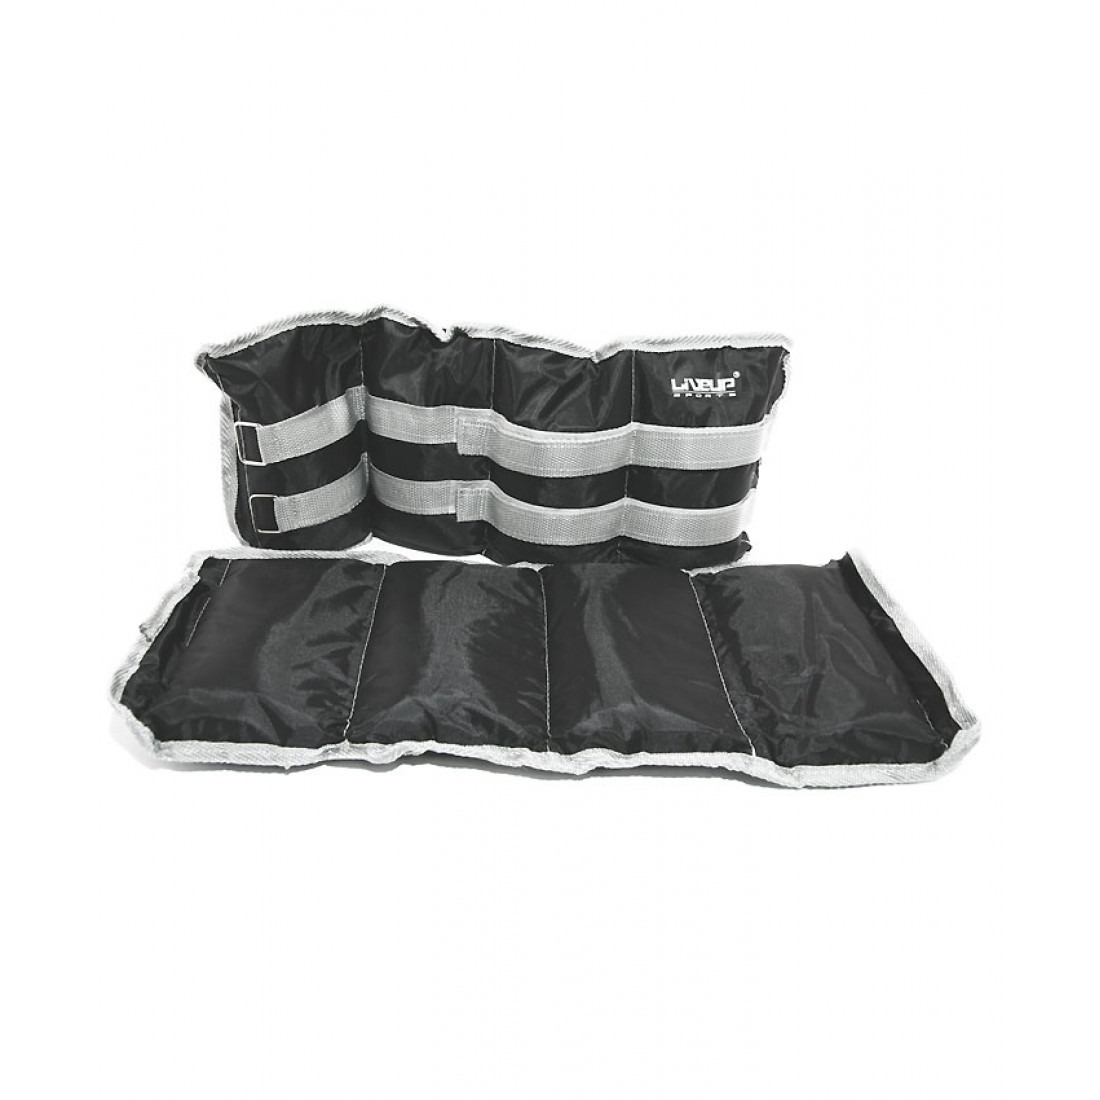 Утяжелители: Утяжелитель для рук / ног LiveUp WRIST/ANKLE WEIGHT 3 кг